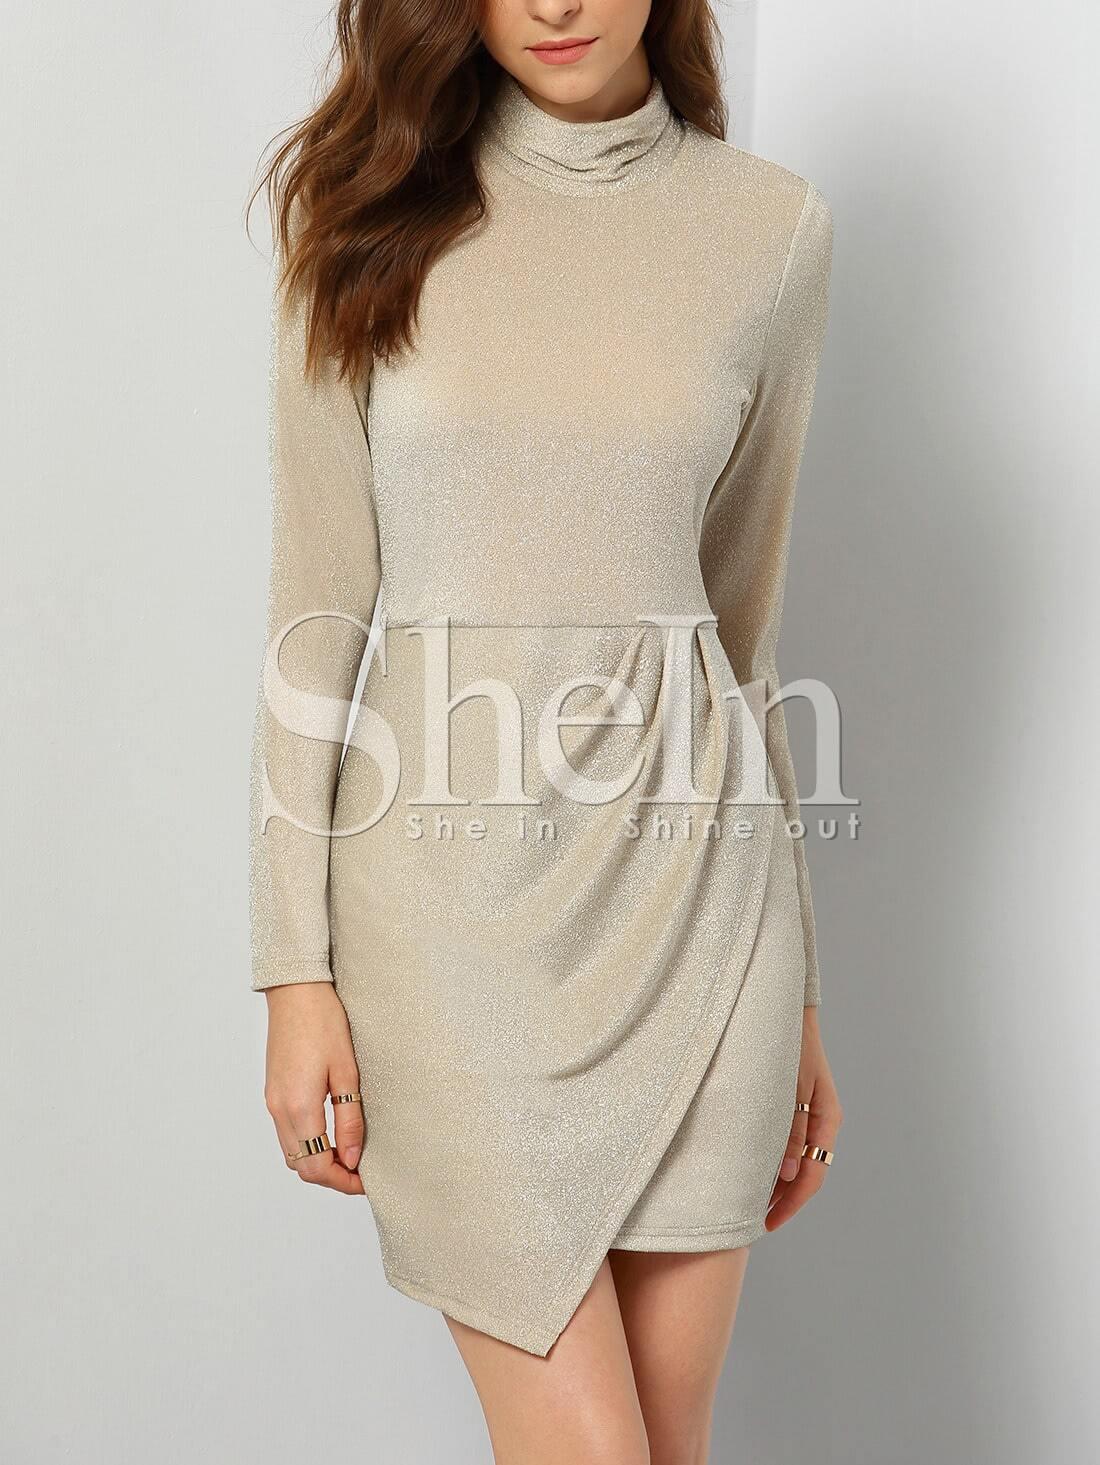 High Neck Long Sleeve Bodycon Asymmetric Dress